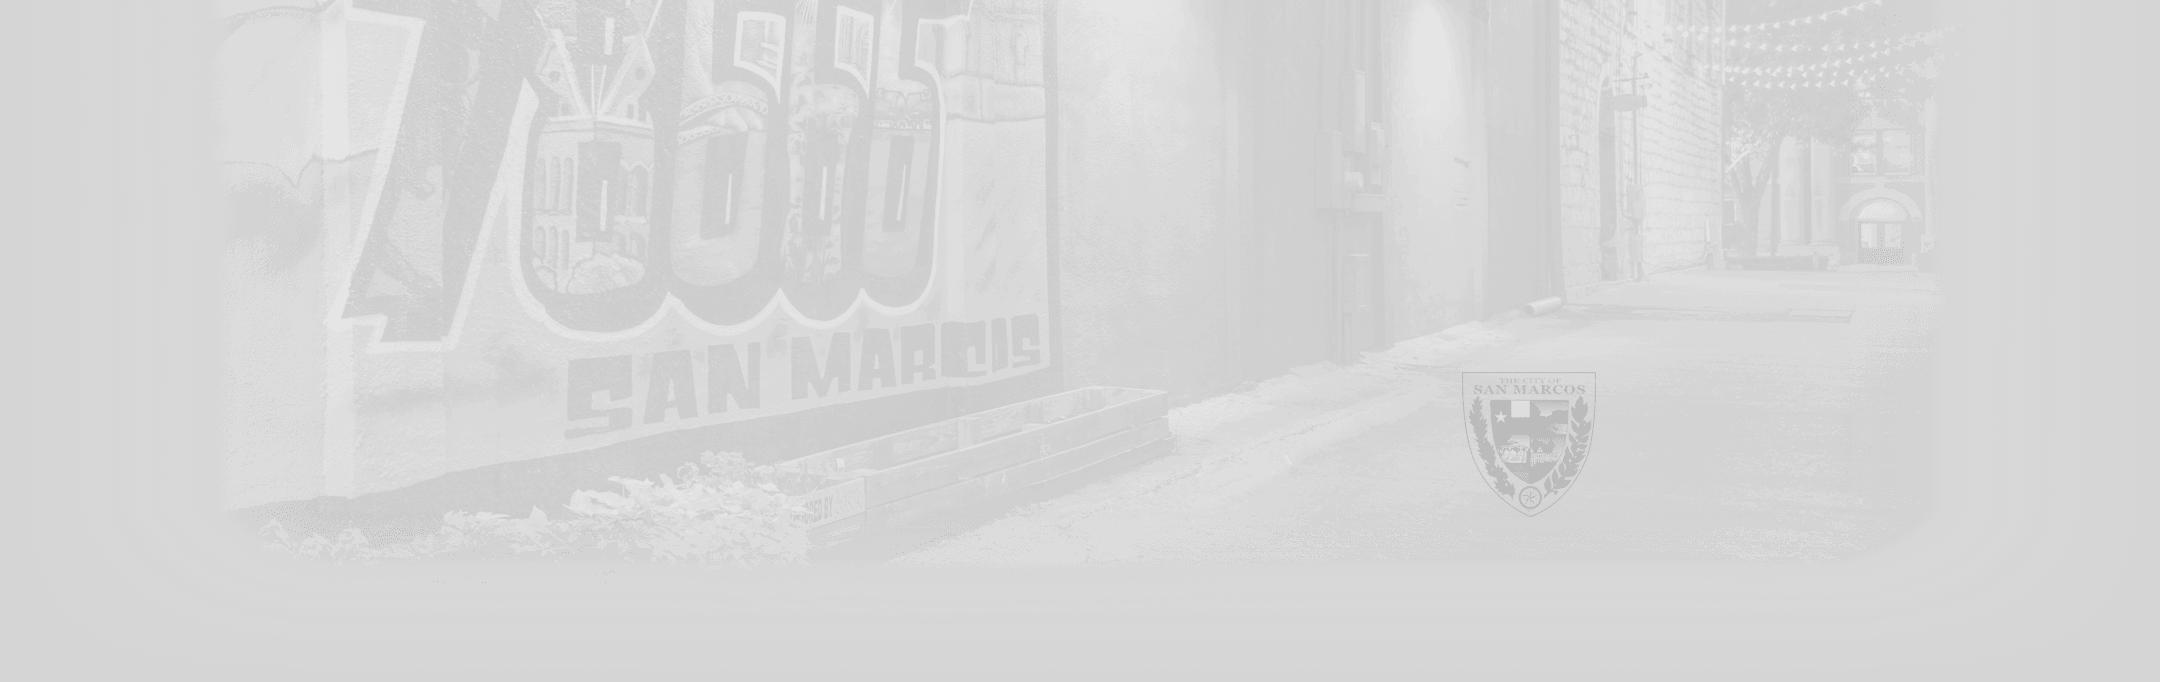 City of San Marcos, TX